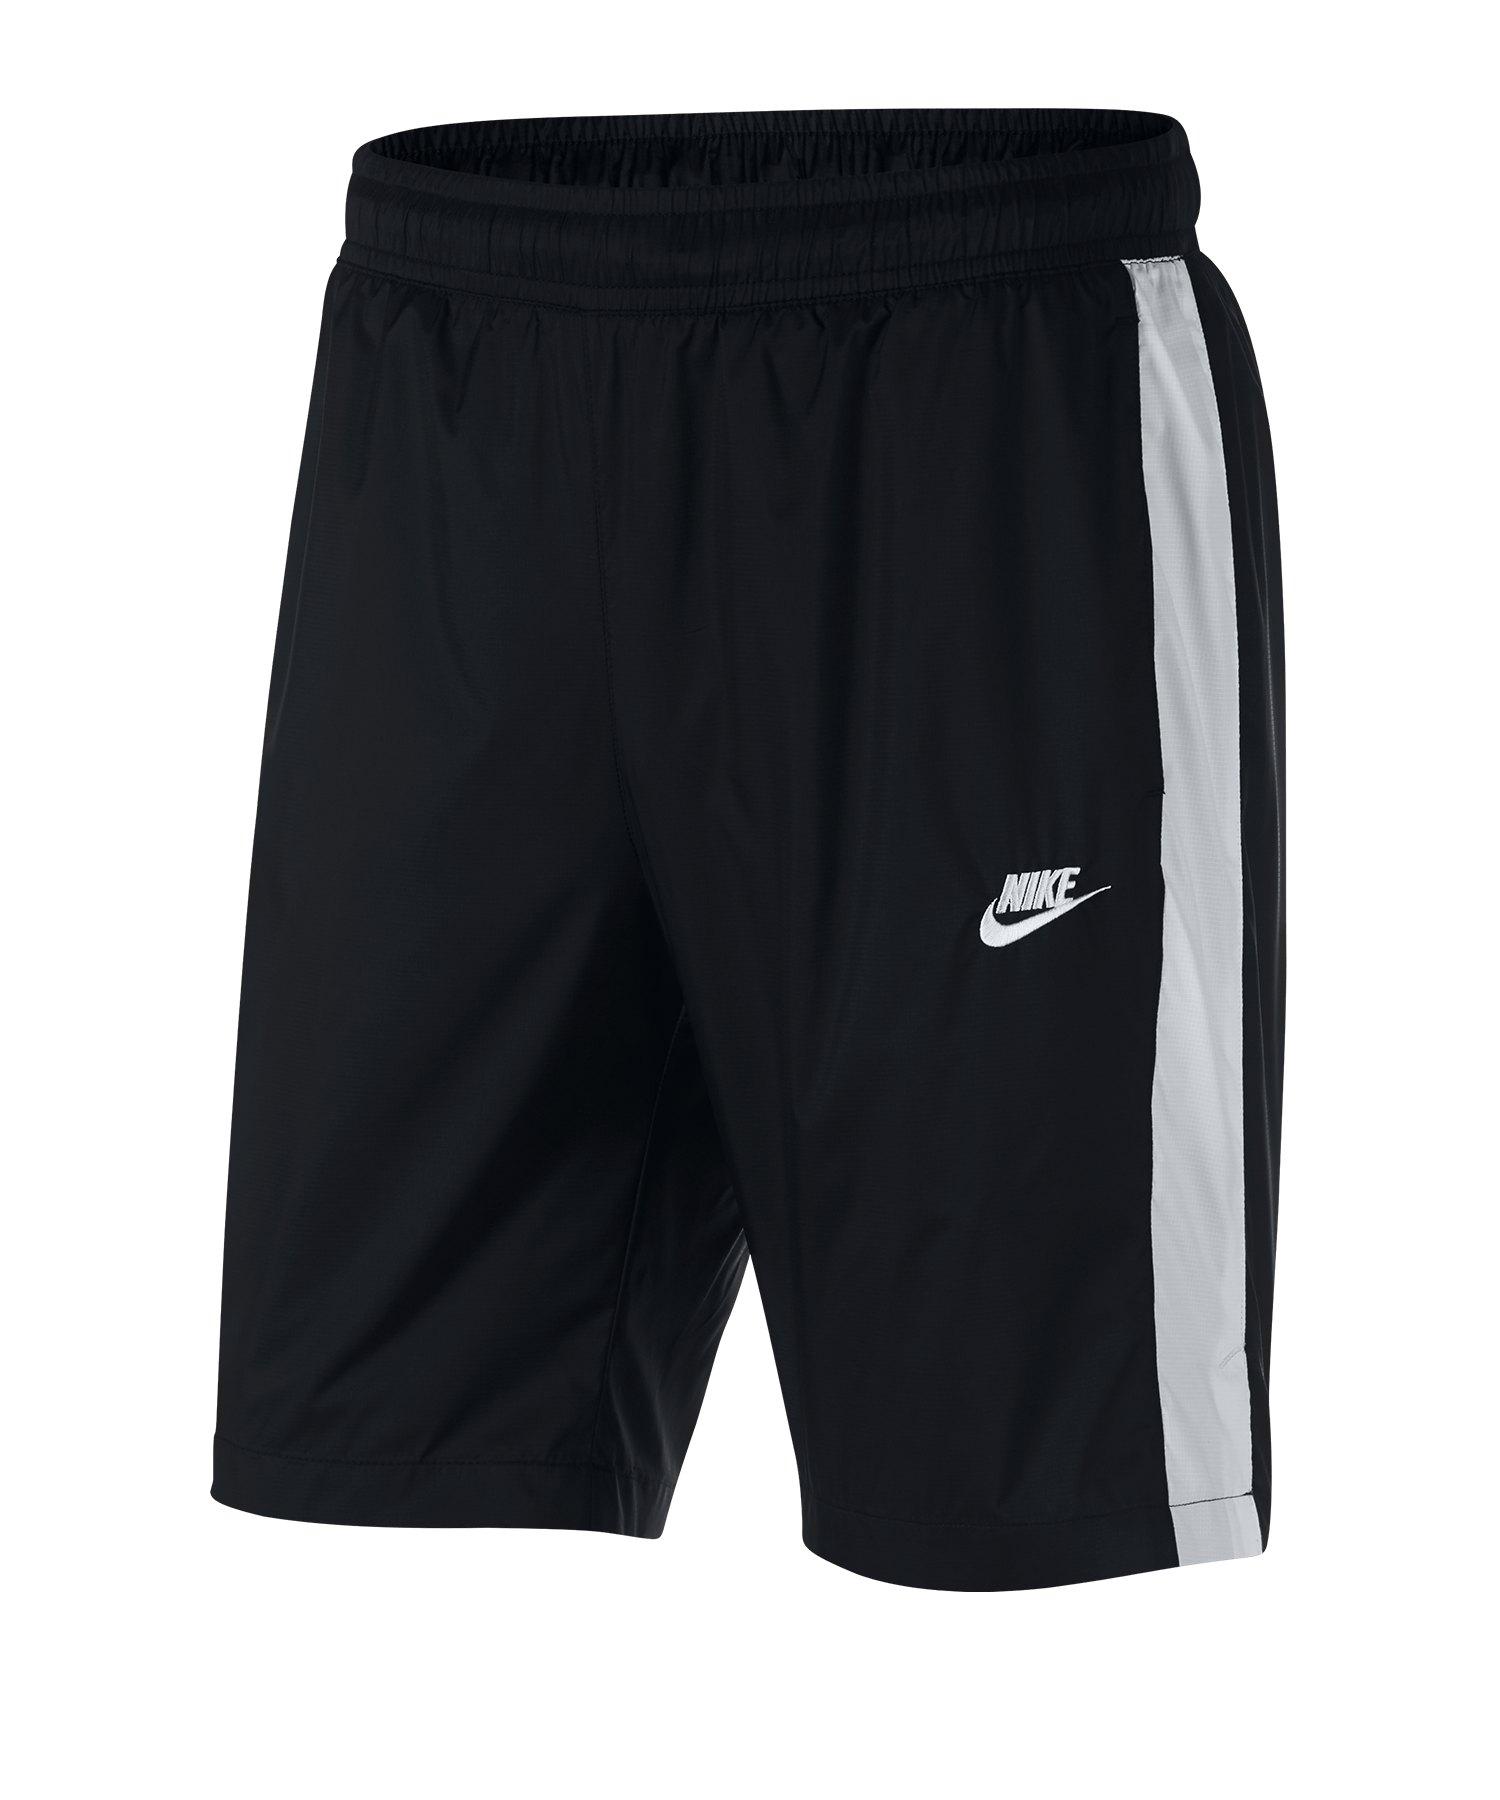 Nike Woven Core Short Schwarz F011 - schwarz